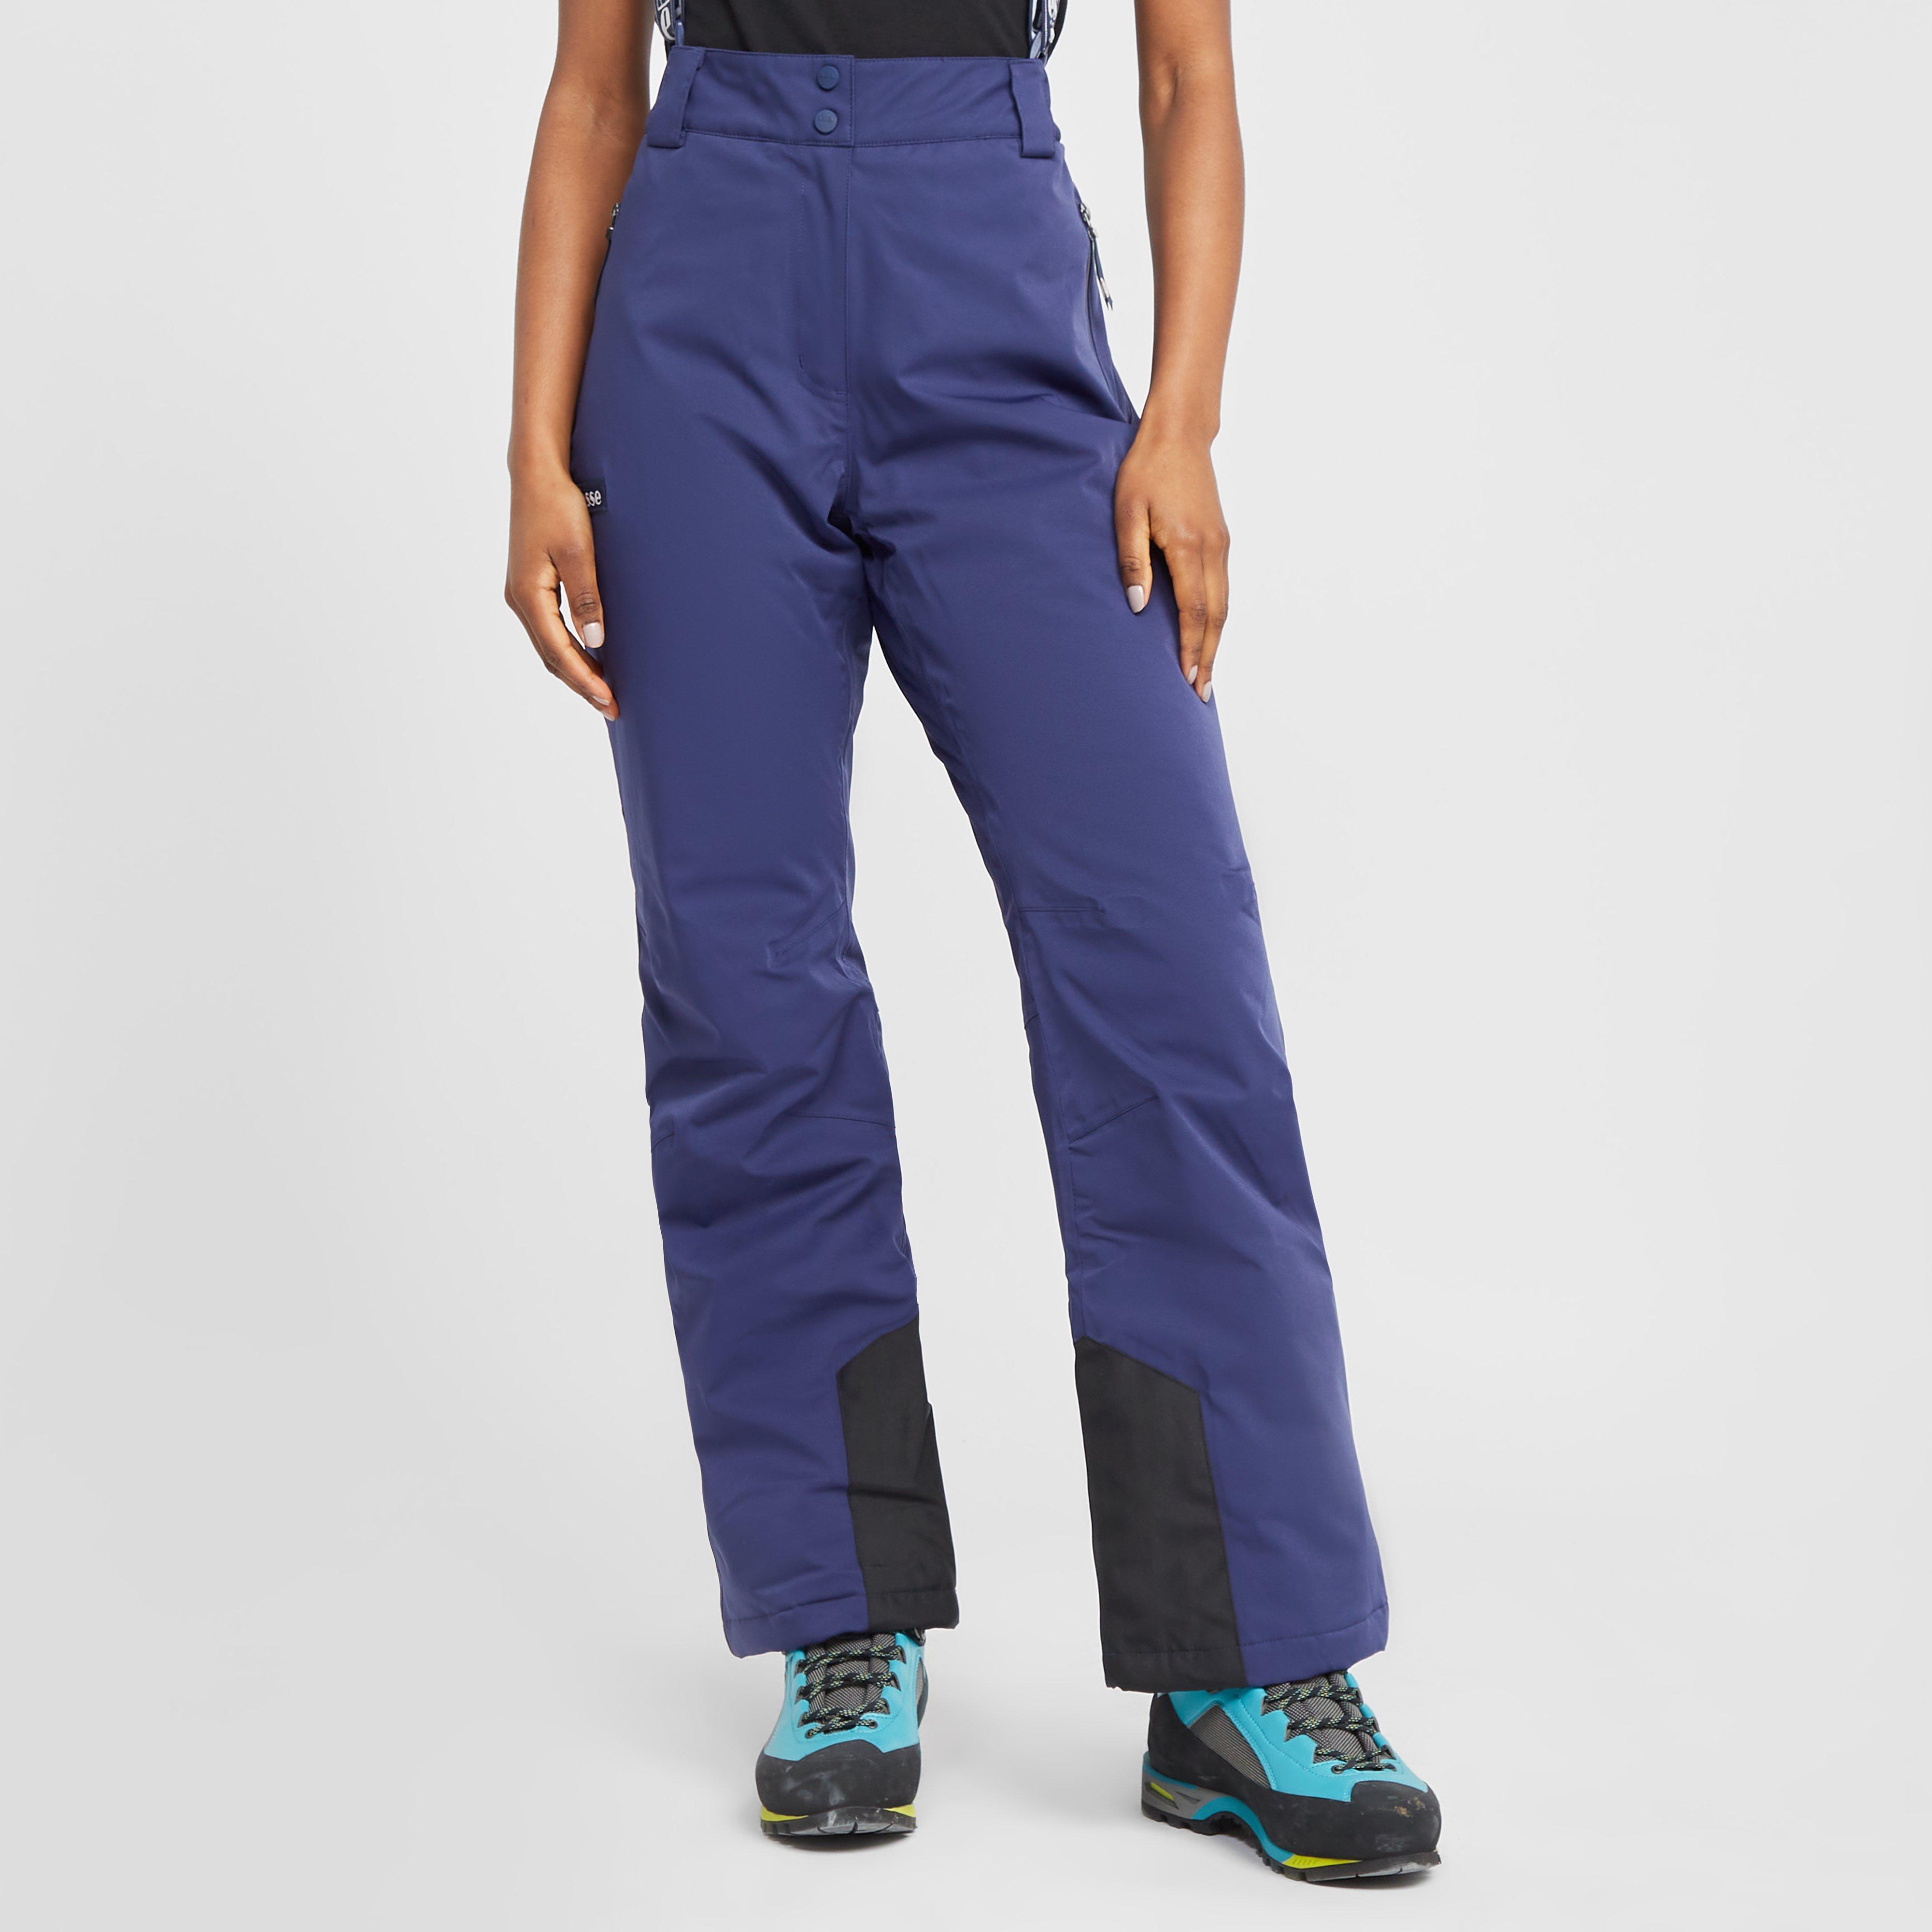 Ellesse Women's Altwegg Salopettes, Blue/Blue